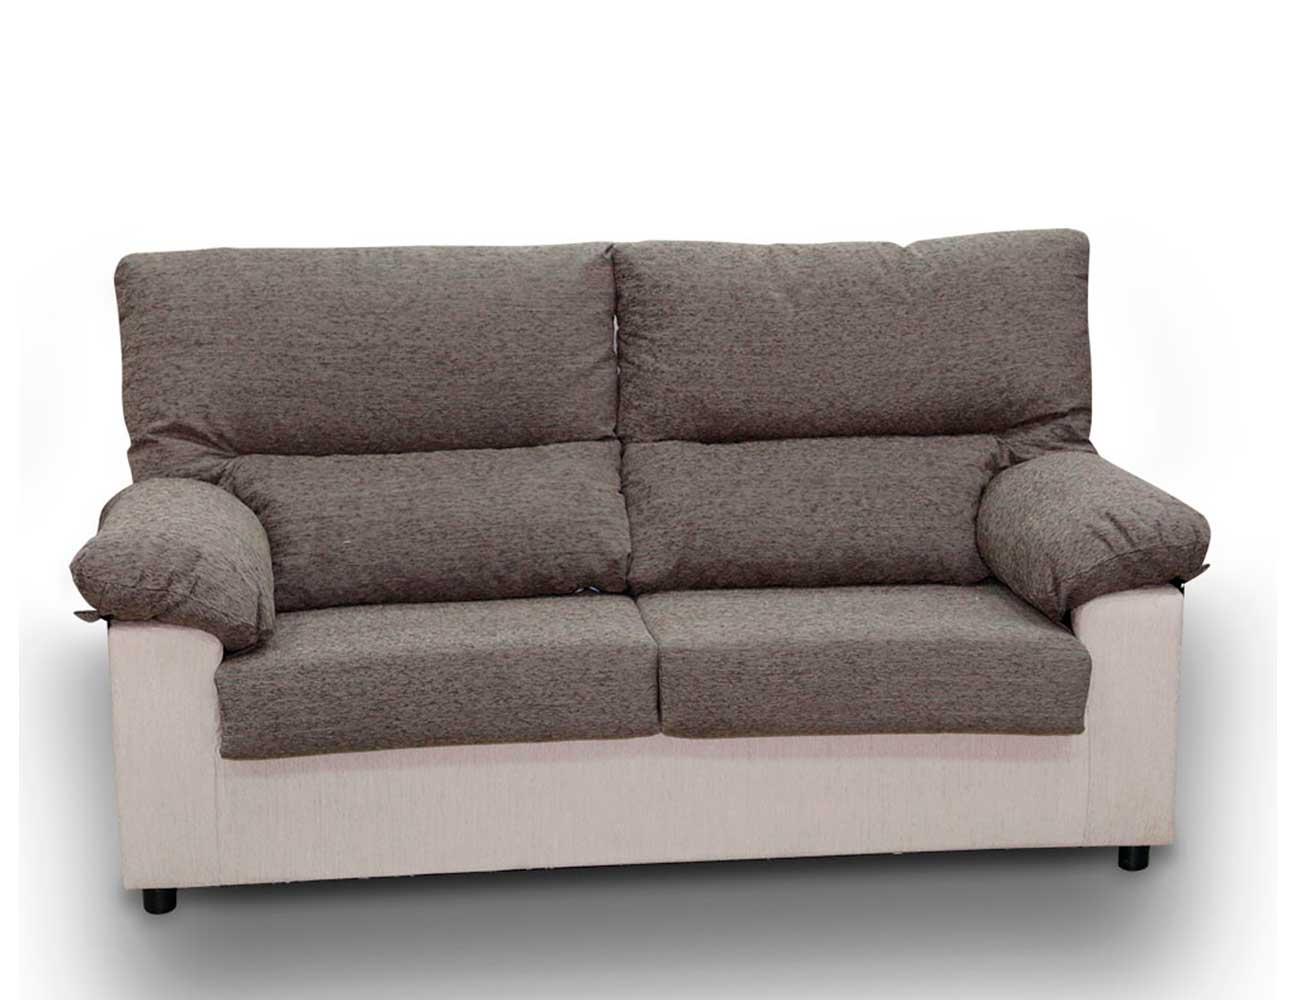 Sofa 3 plazas barato21